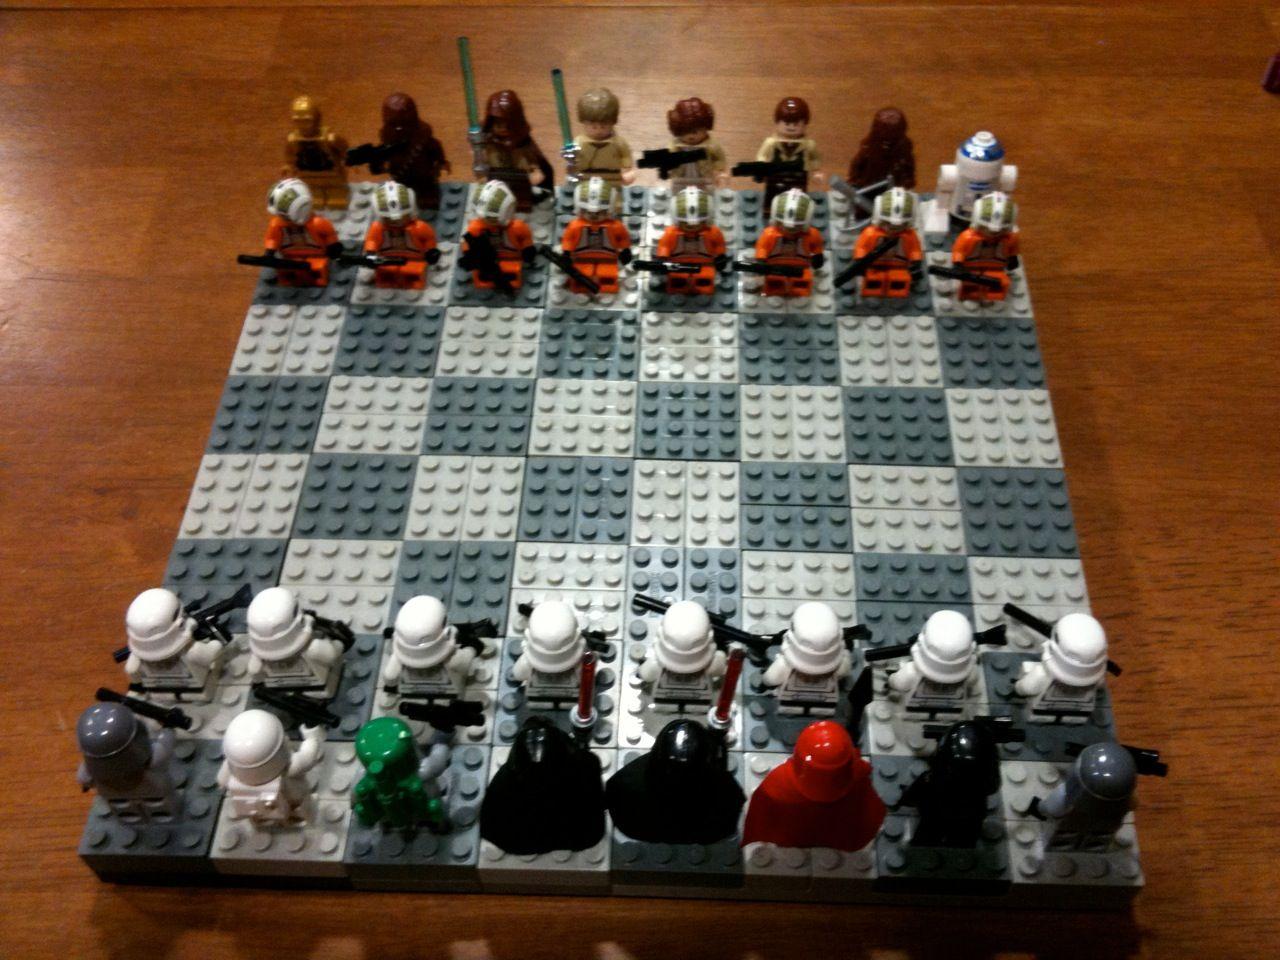 Delightful Lego Star Wars Google Image Result For  Https://images.nonexiste.net/popular/wp Content/uploads/2011/12/Lego Star Wars  Chess.jpeg